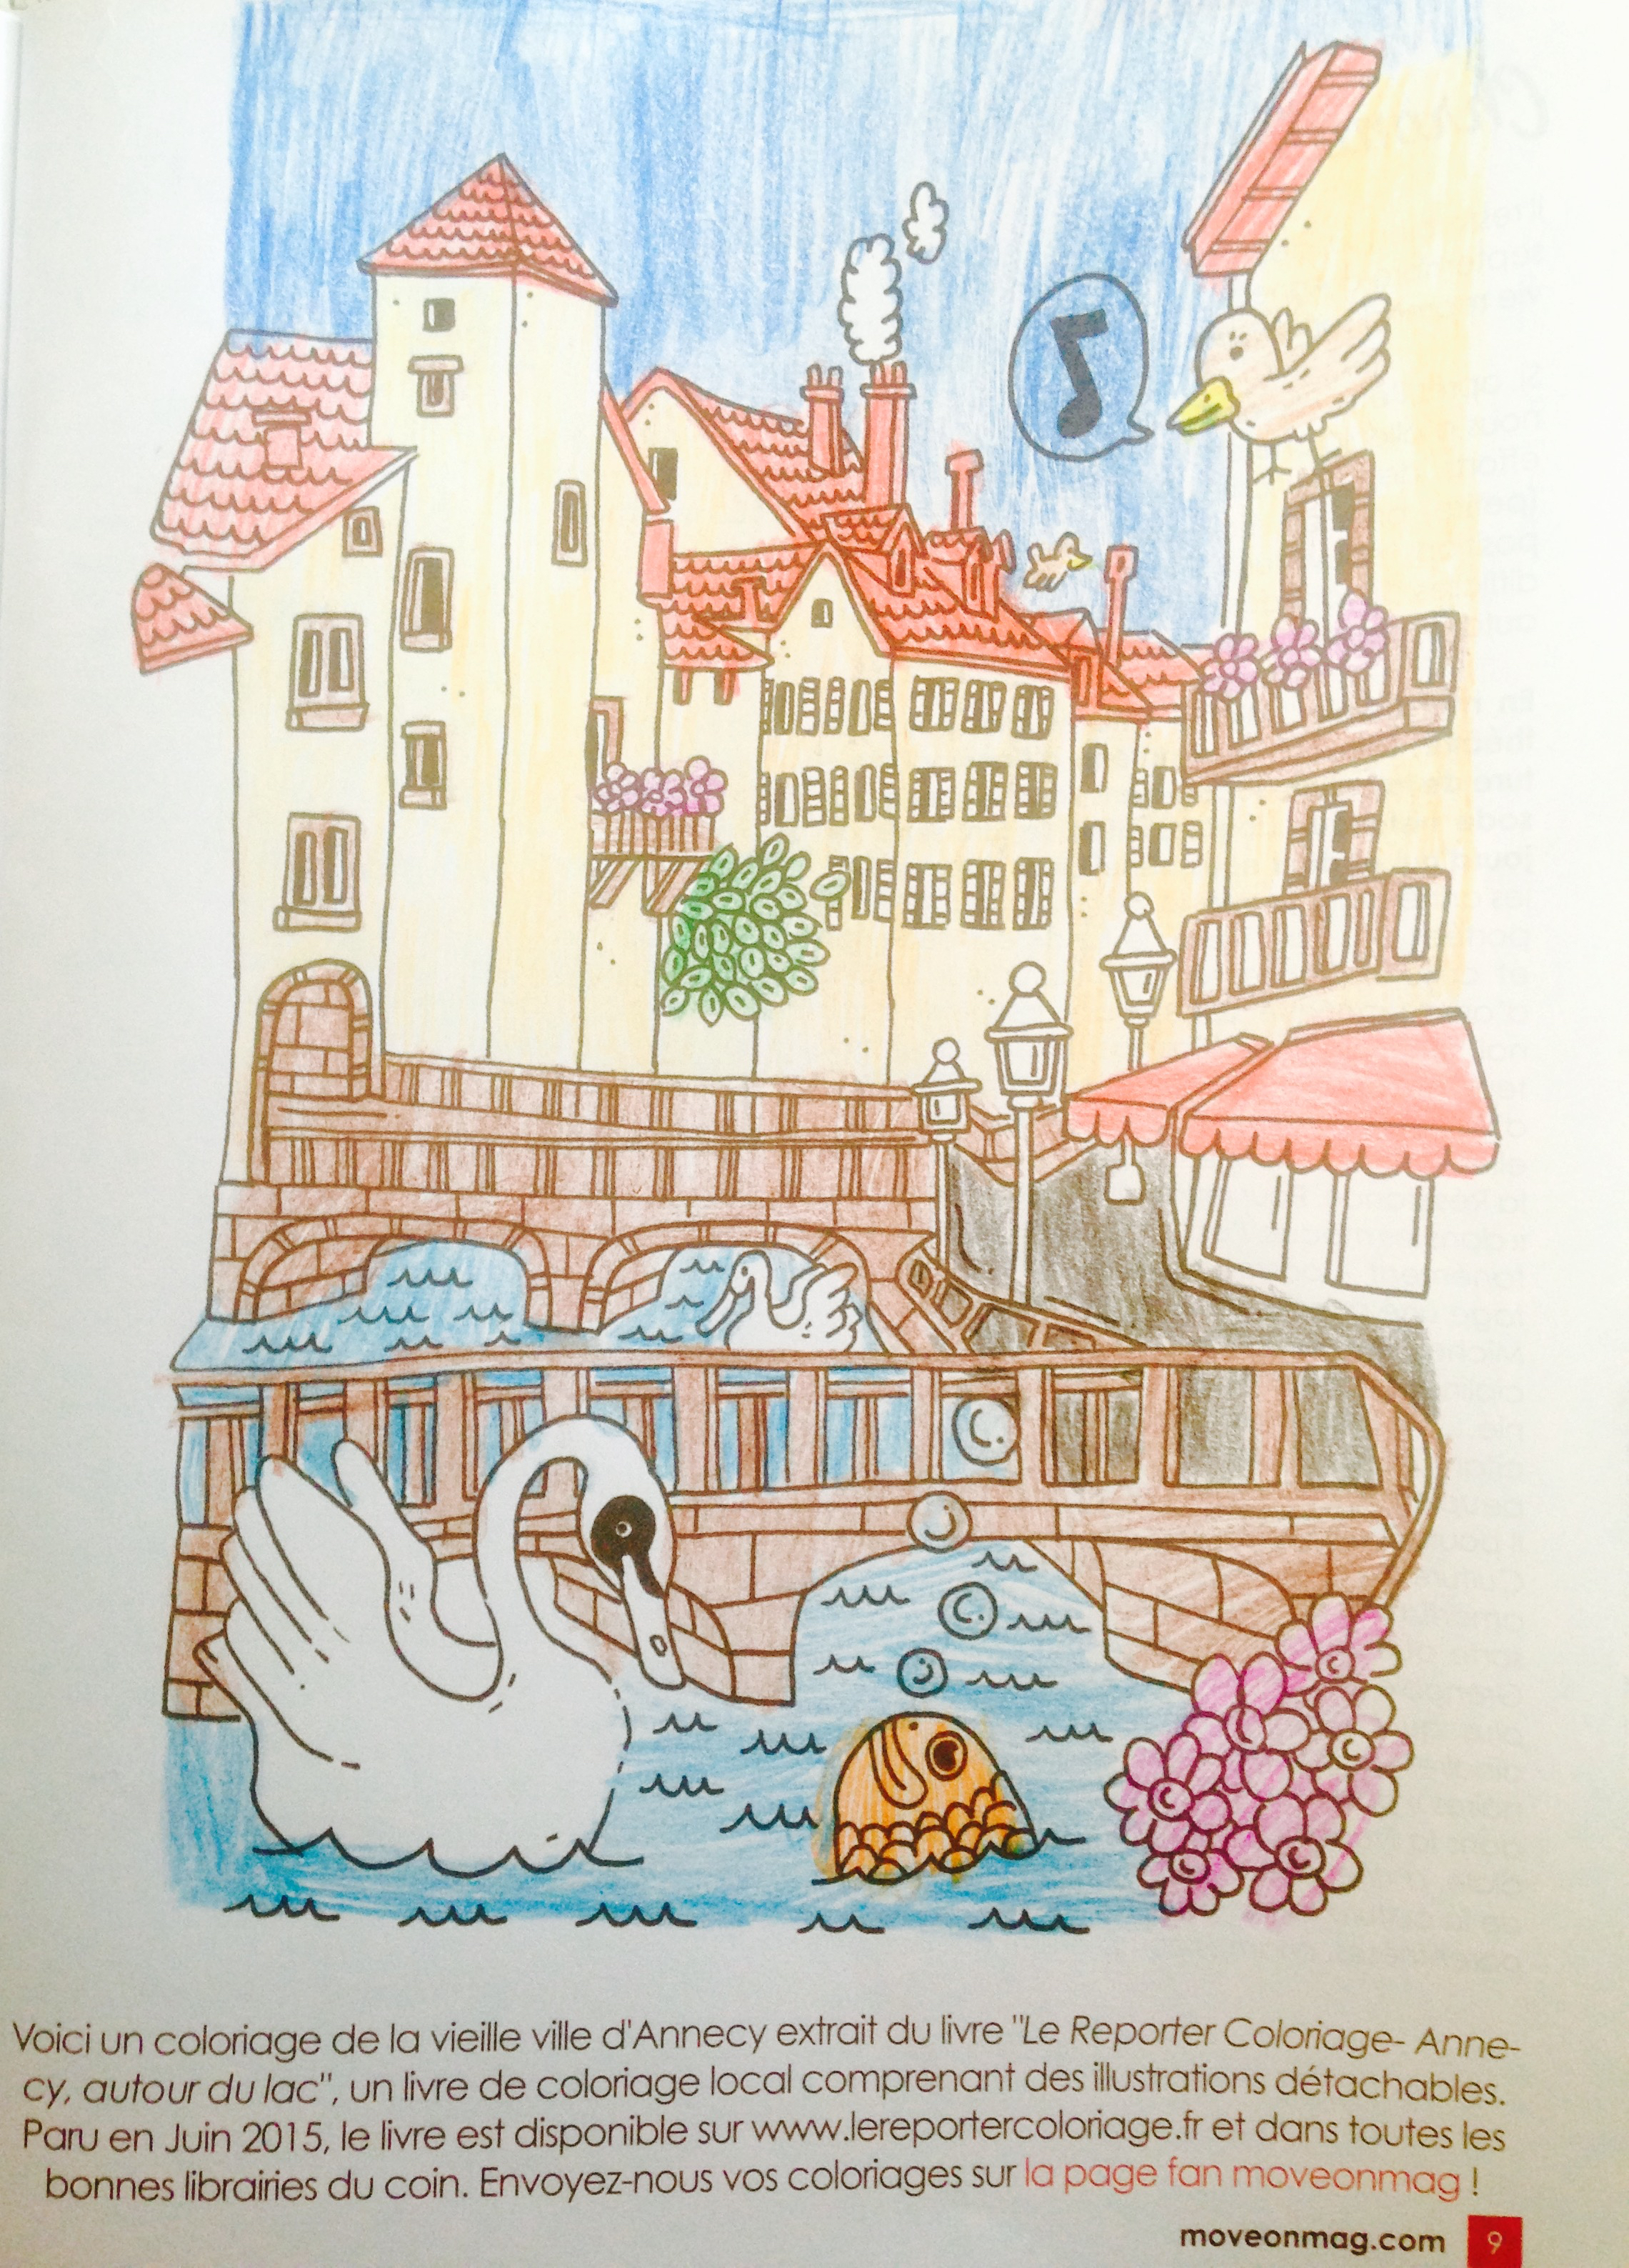 Annecy, selon Jana Roux